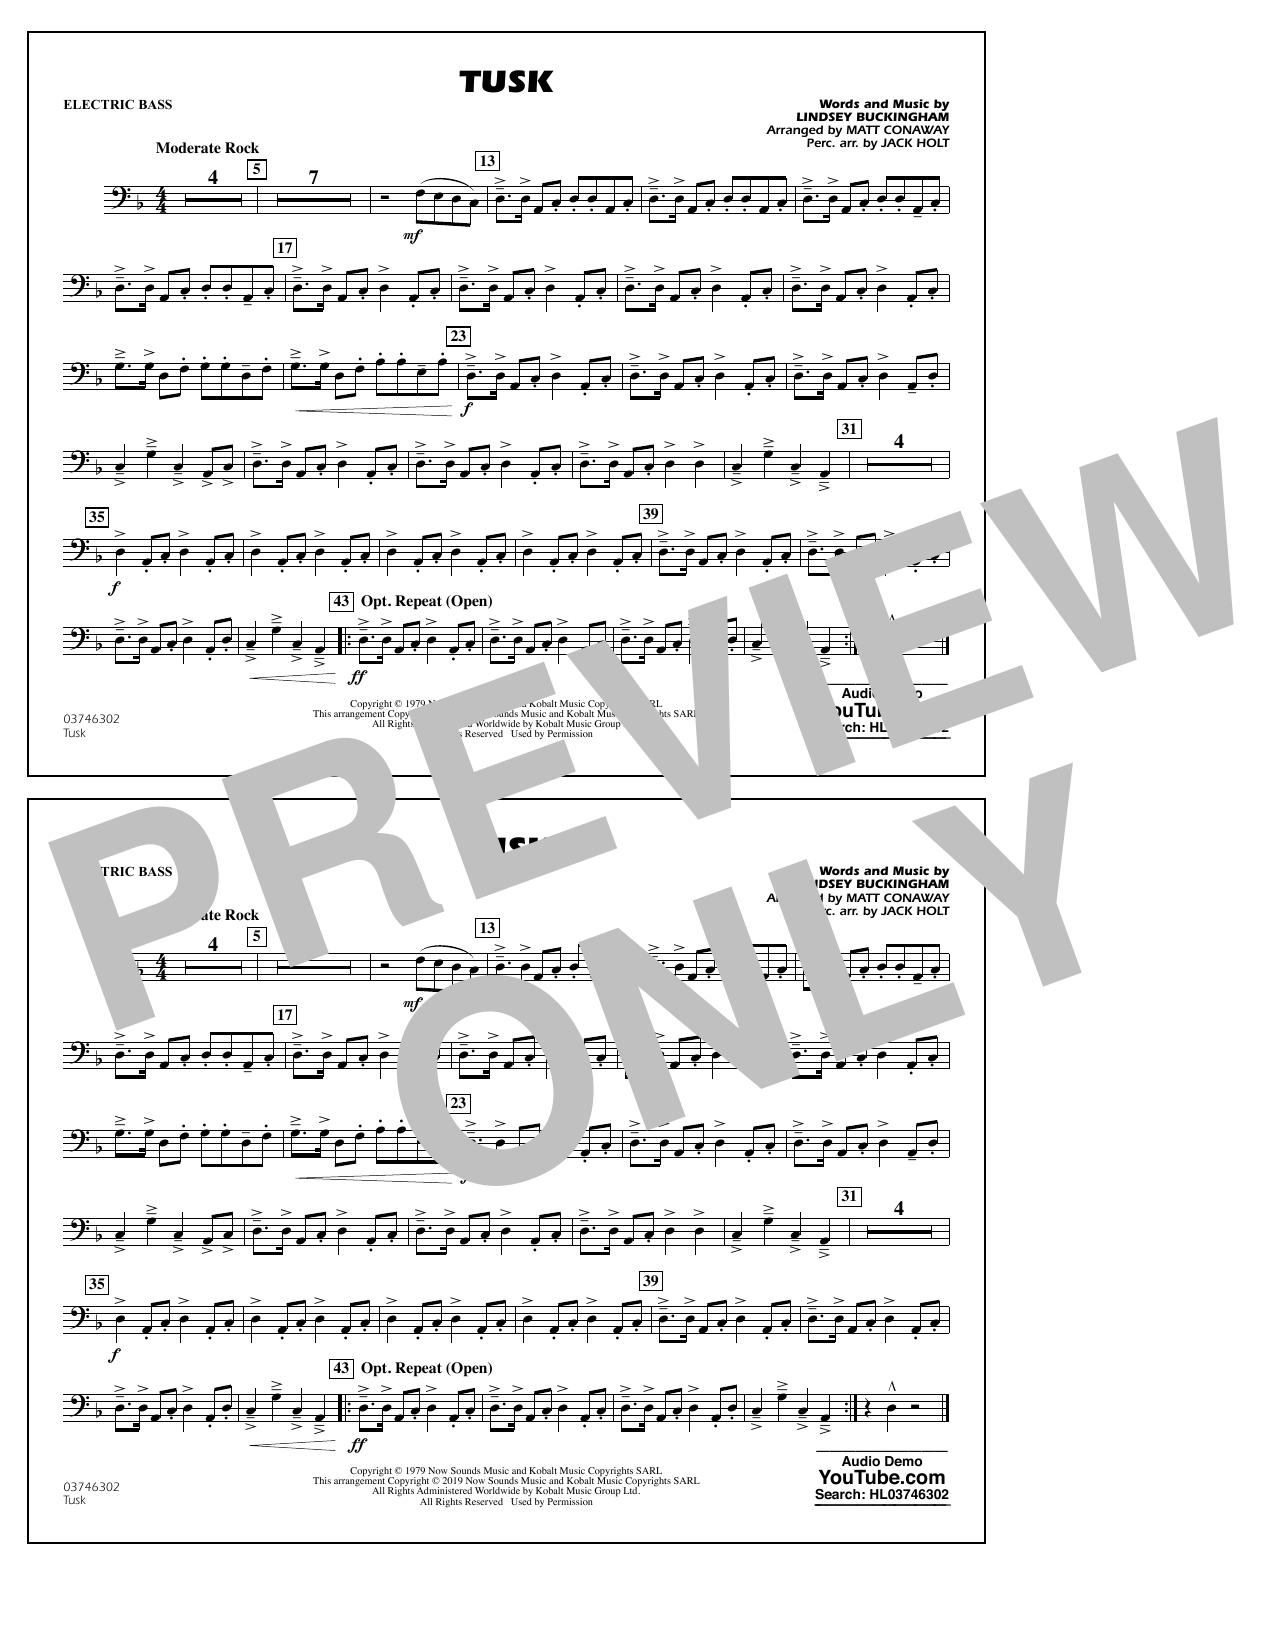 Fleetwood Mac Tusk (arr. Matt Conaway) - Electric Bass sheet music notes and chords